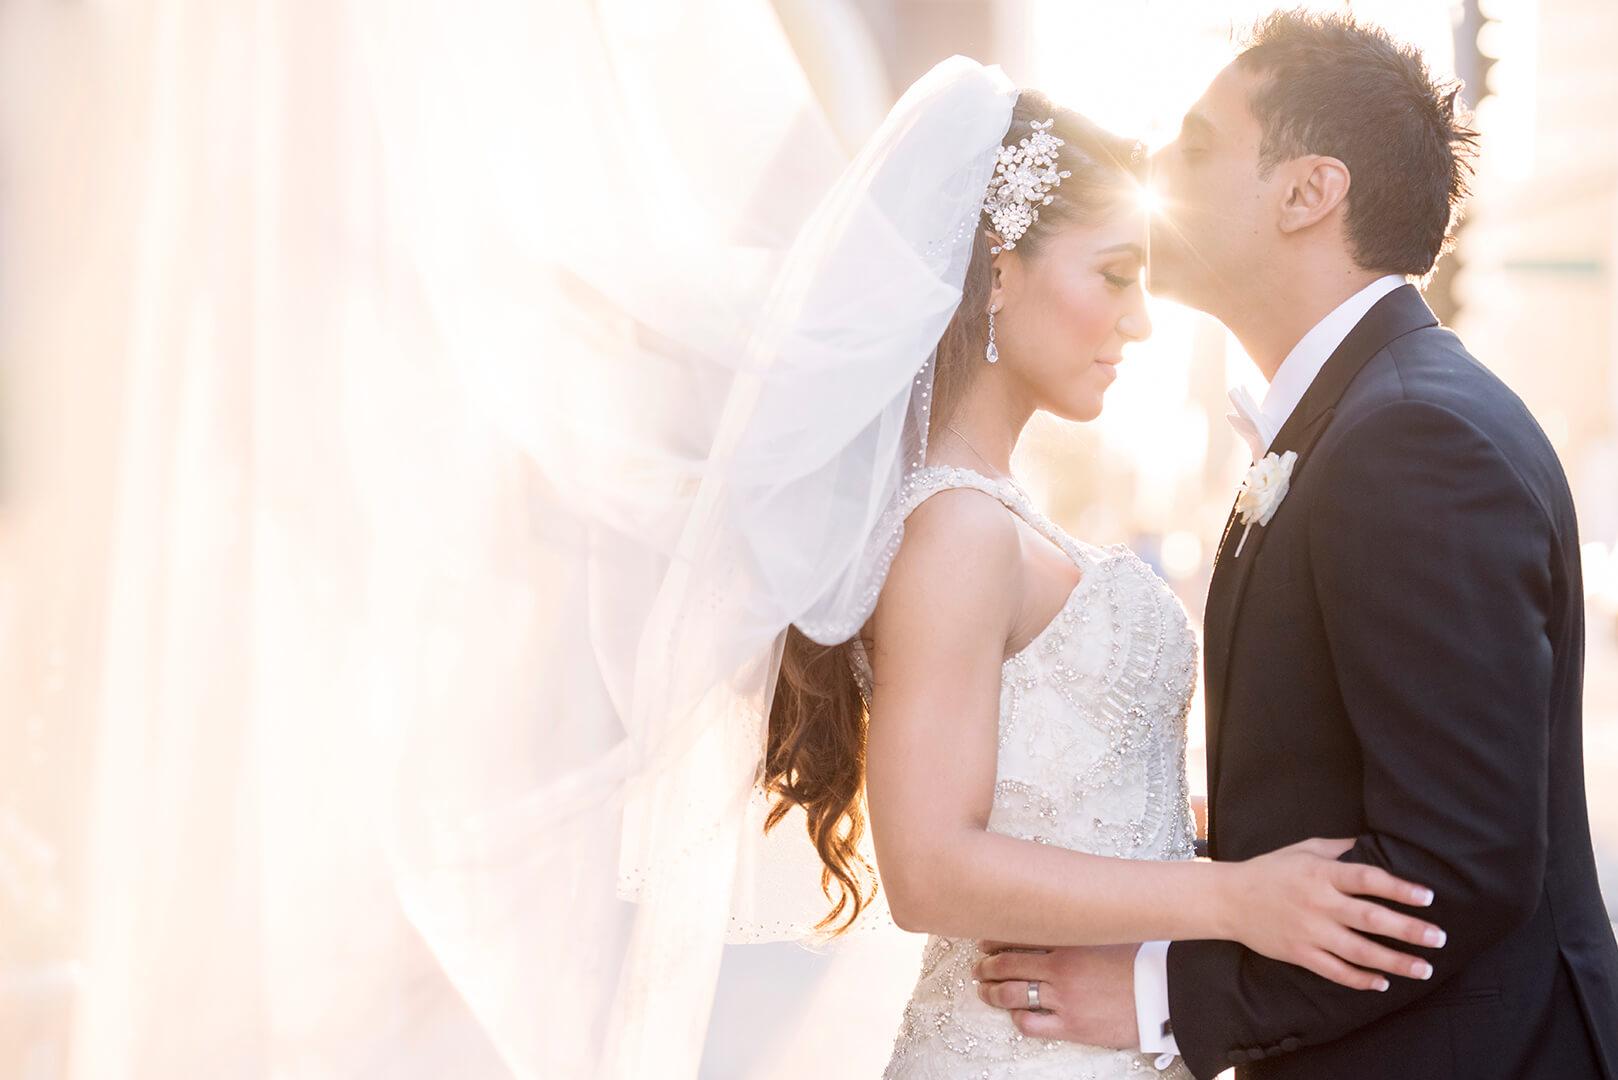 30_KLK Photography_Beverly Wilshire Wedding_Beverly Hills Wedding Photographer